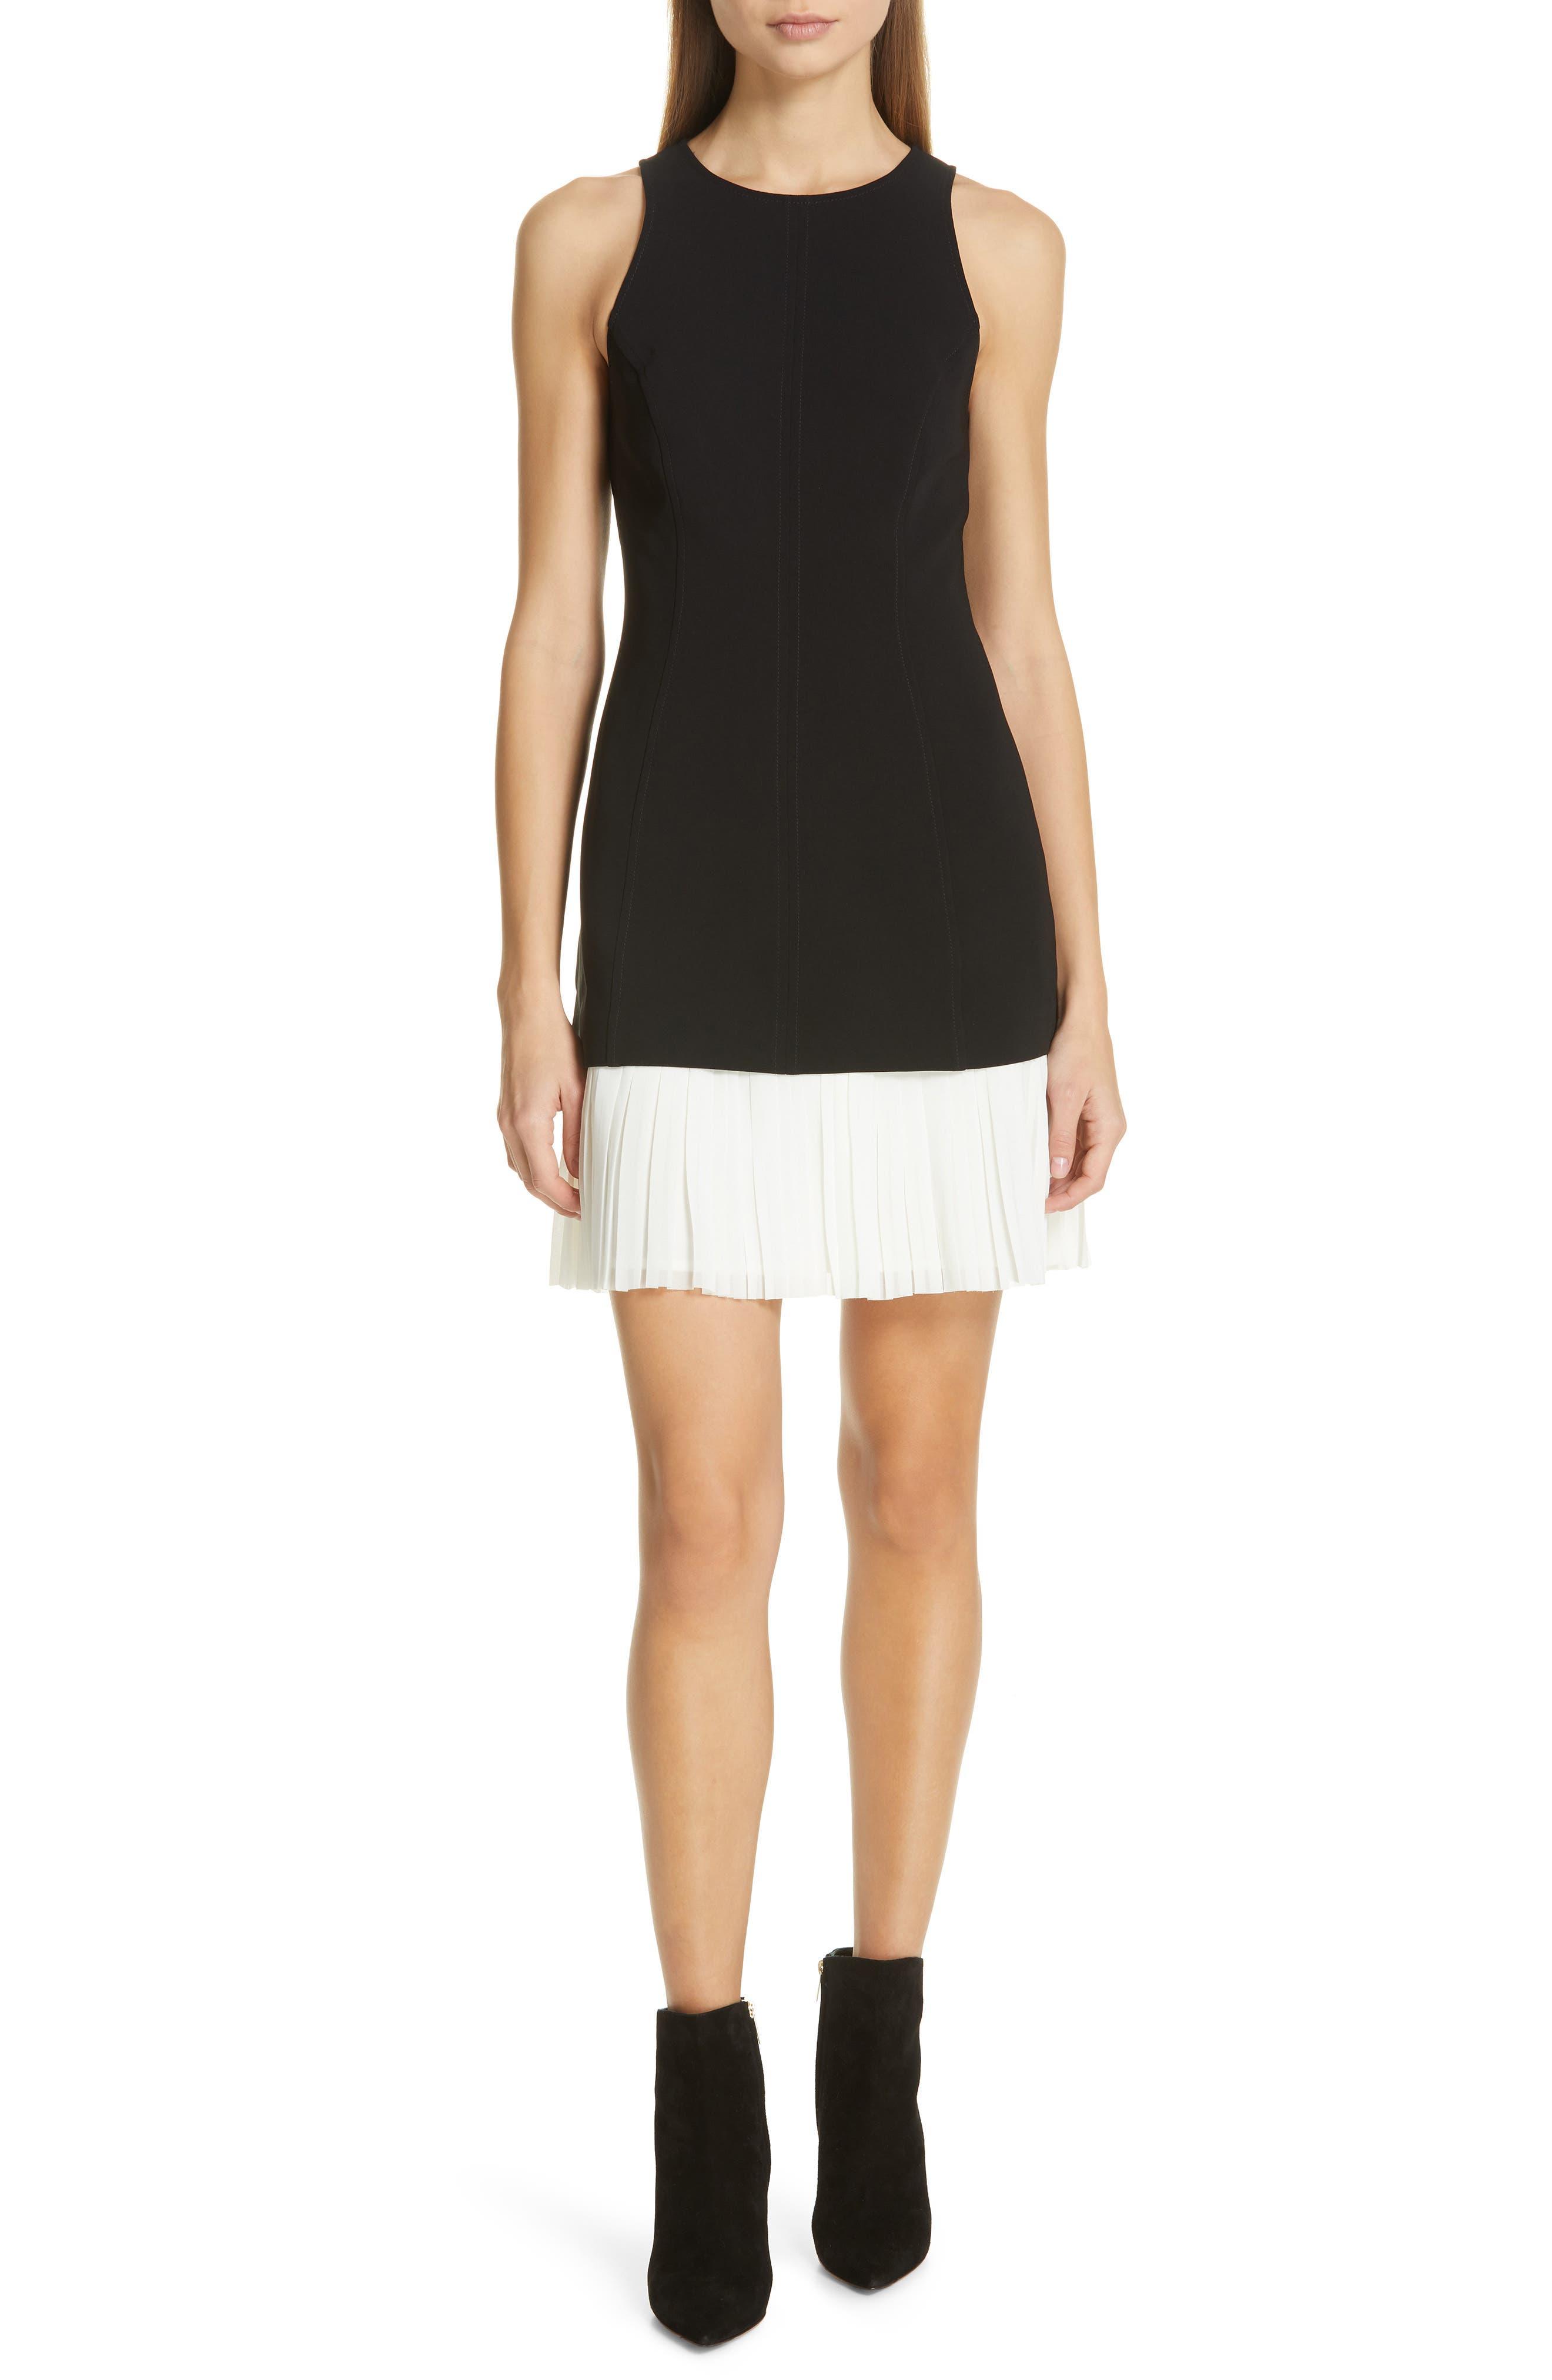 Cinq A Sept Catronia Pleated Sheath Dress, Black